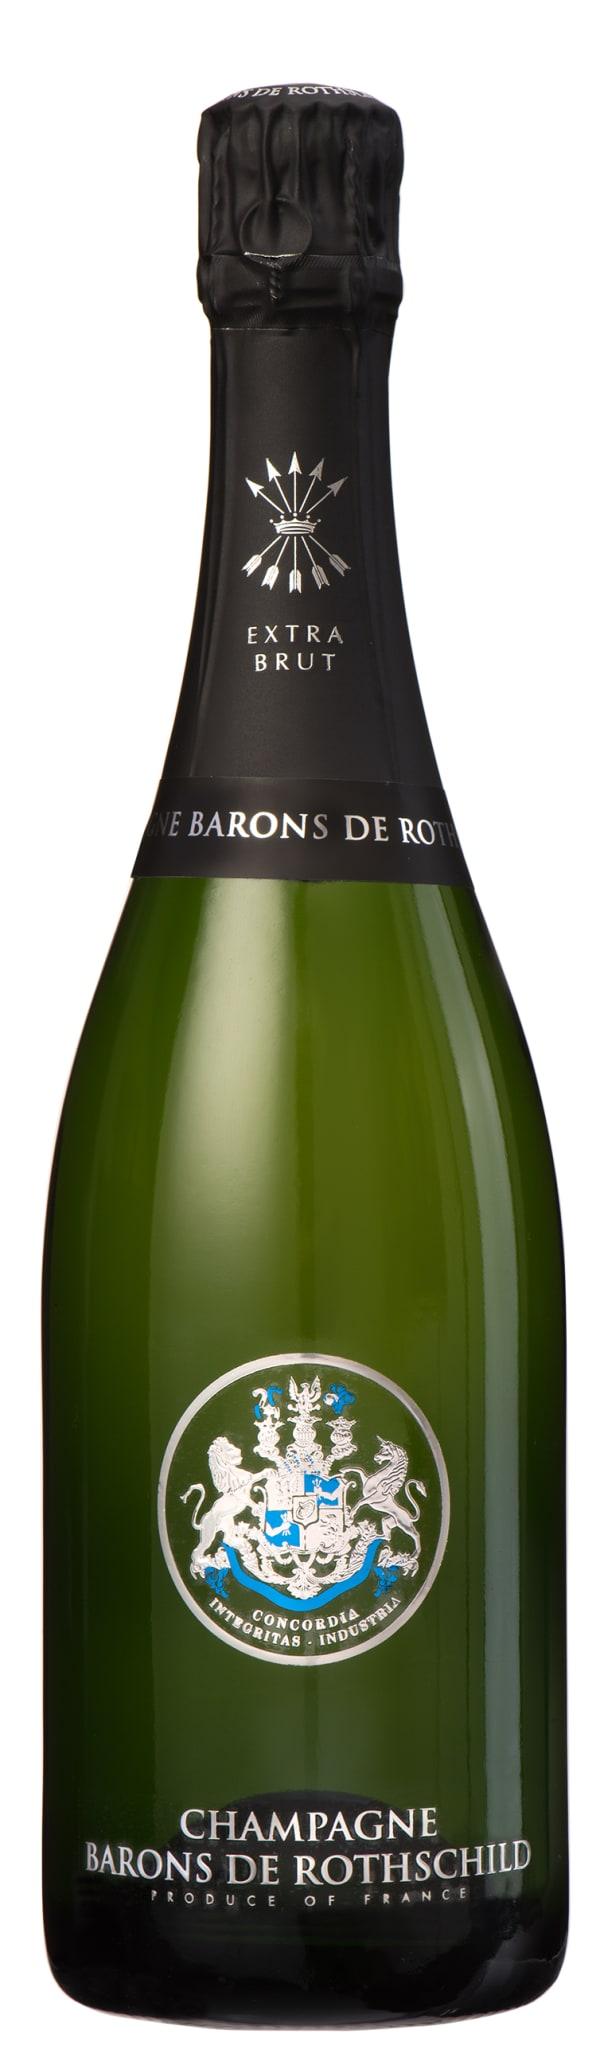 Barons de Rothschild Champagne Extra Brut